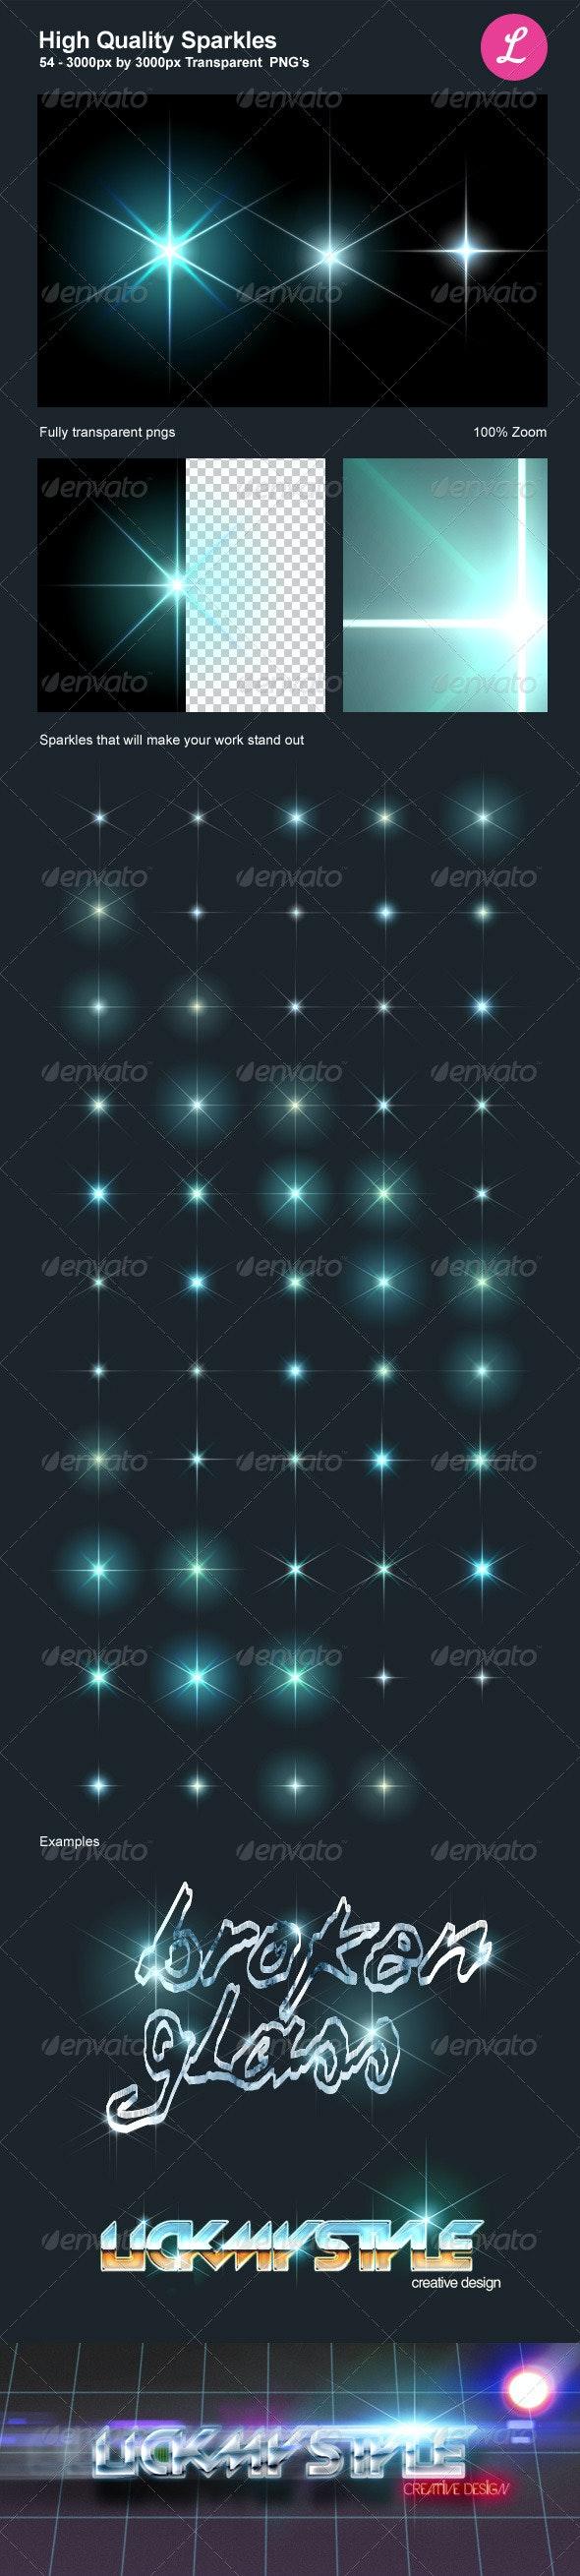 High Quality Sparkles - Decorative Graphics